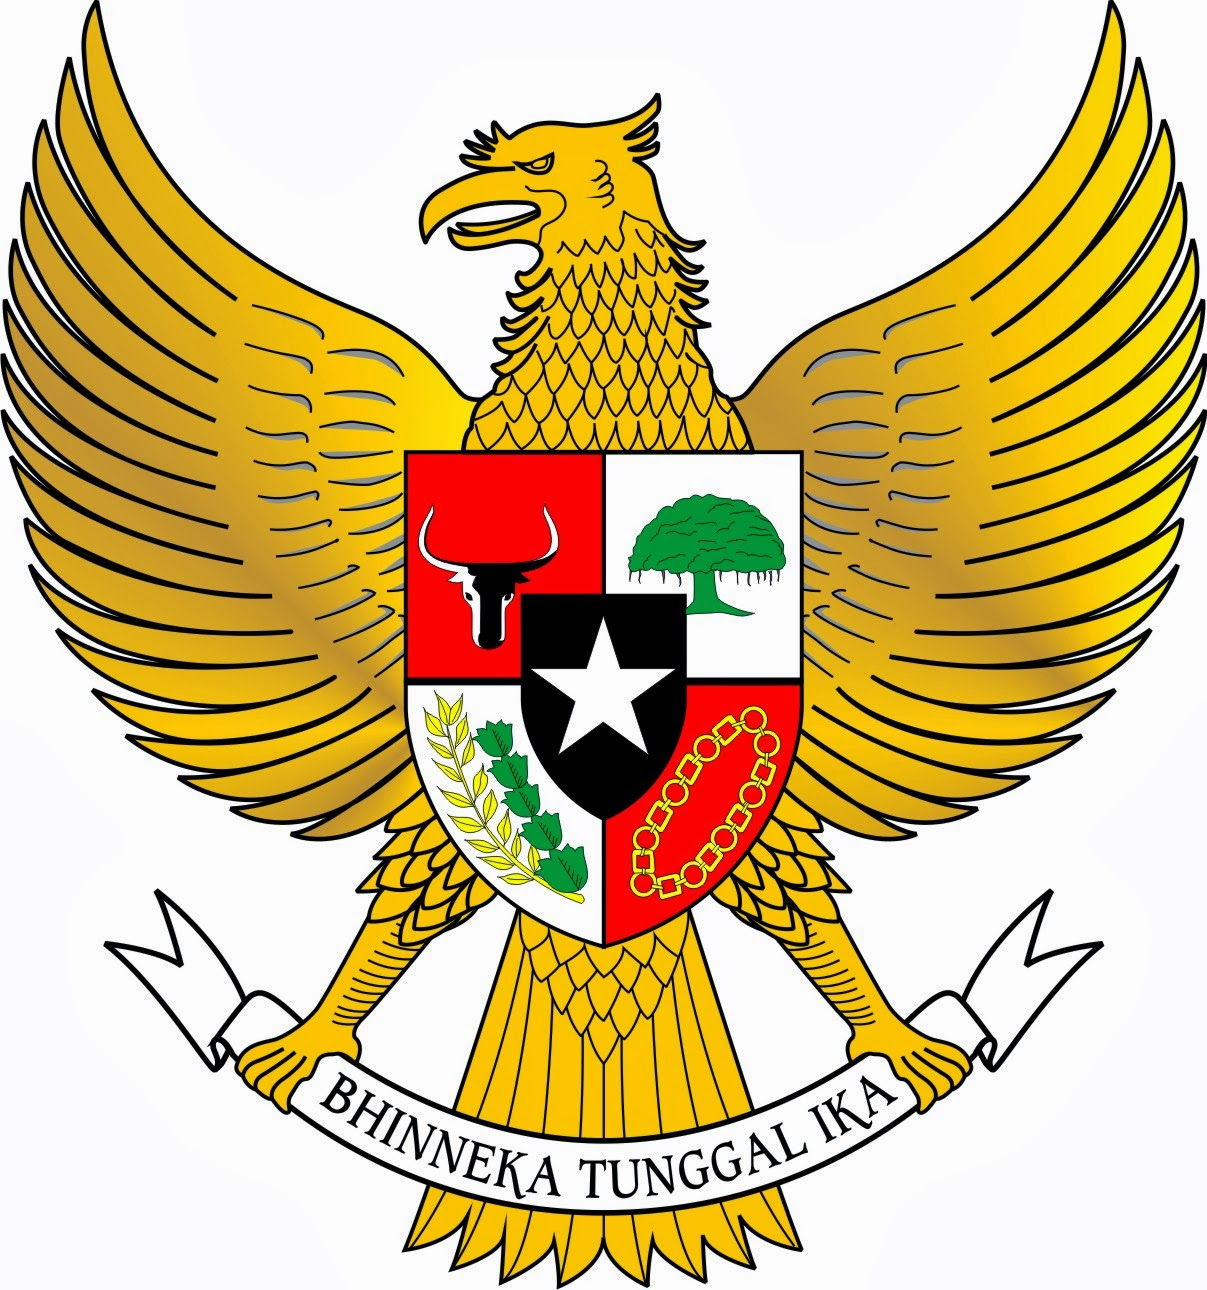 gambar garuda pancasila indonesia - gambar binatang